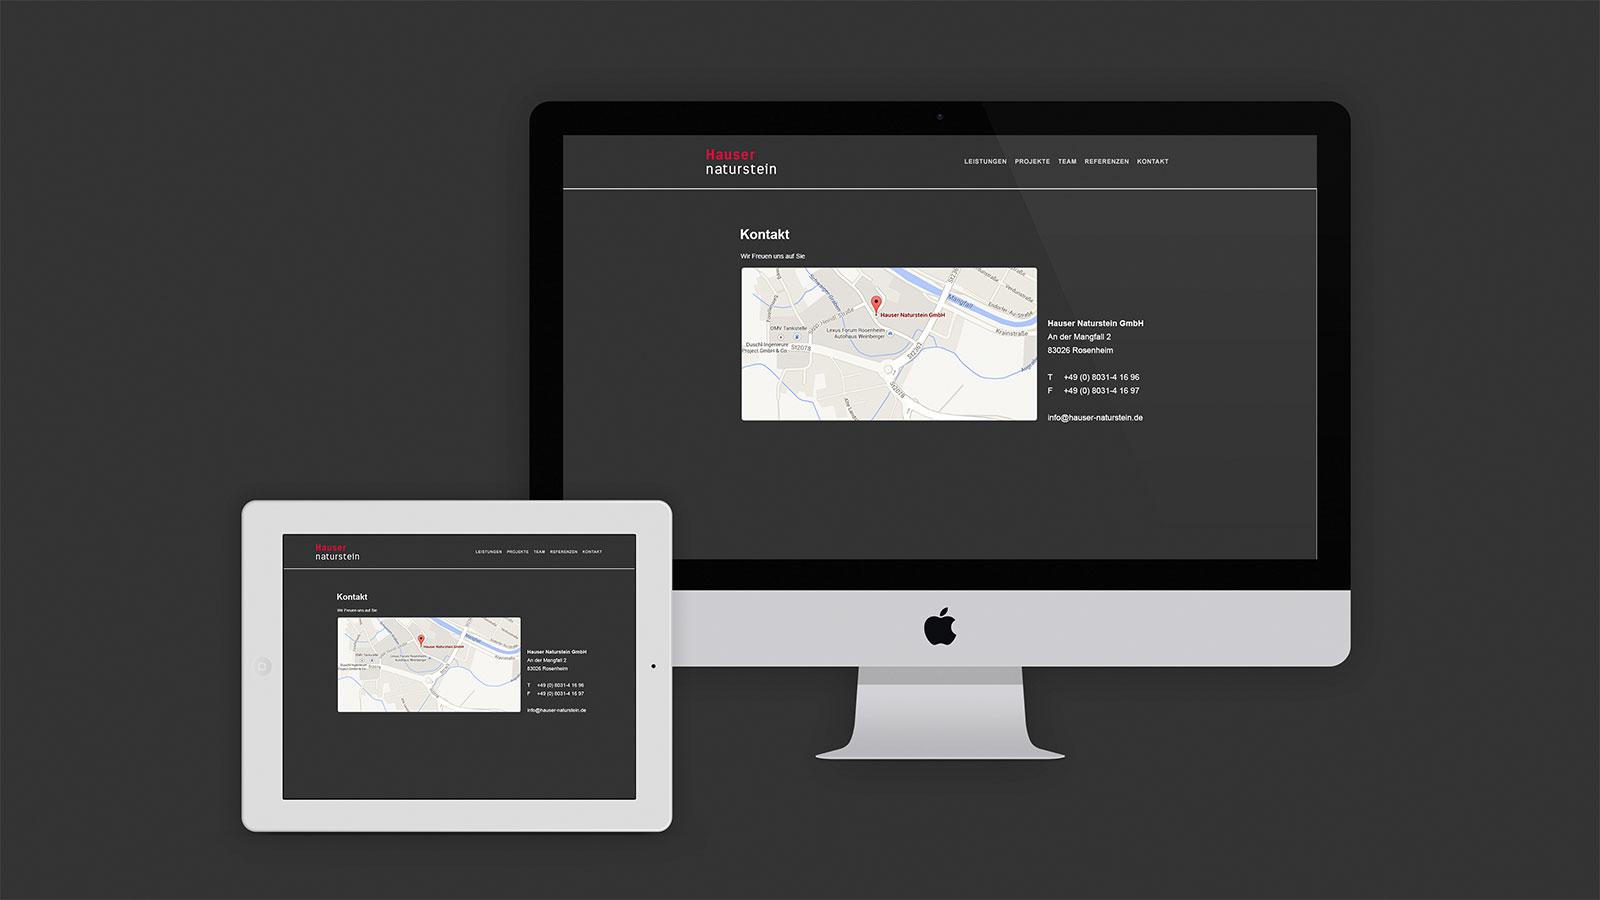 hauser-homepage-6